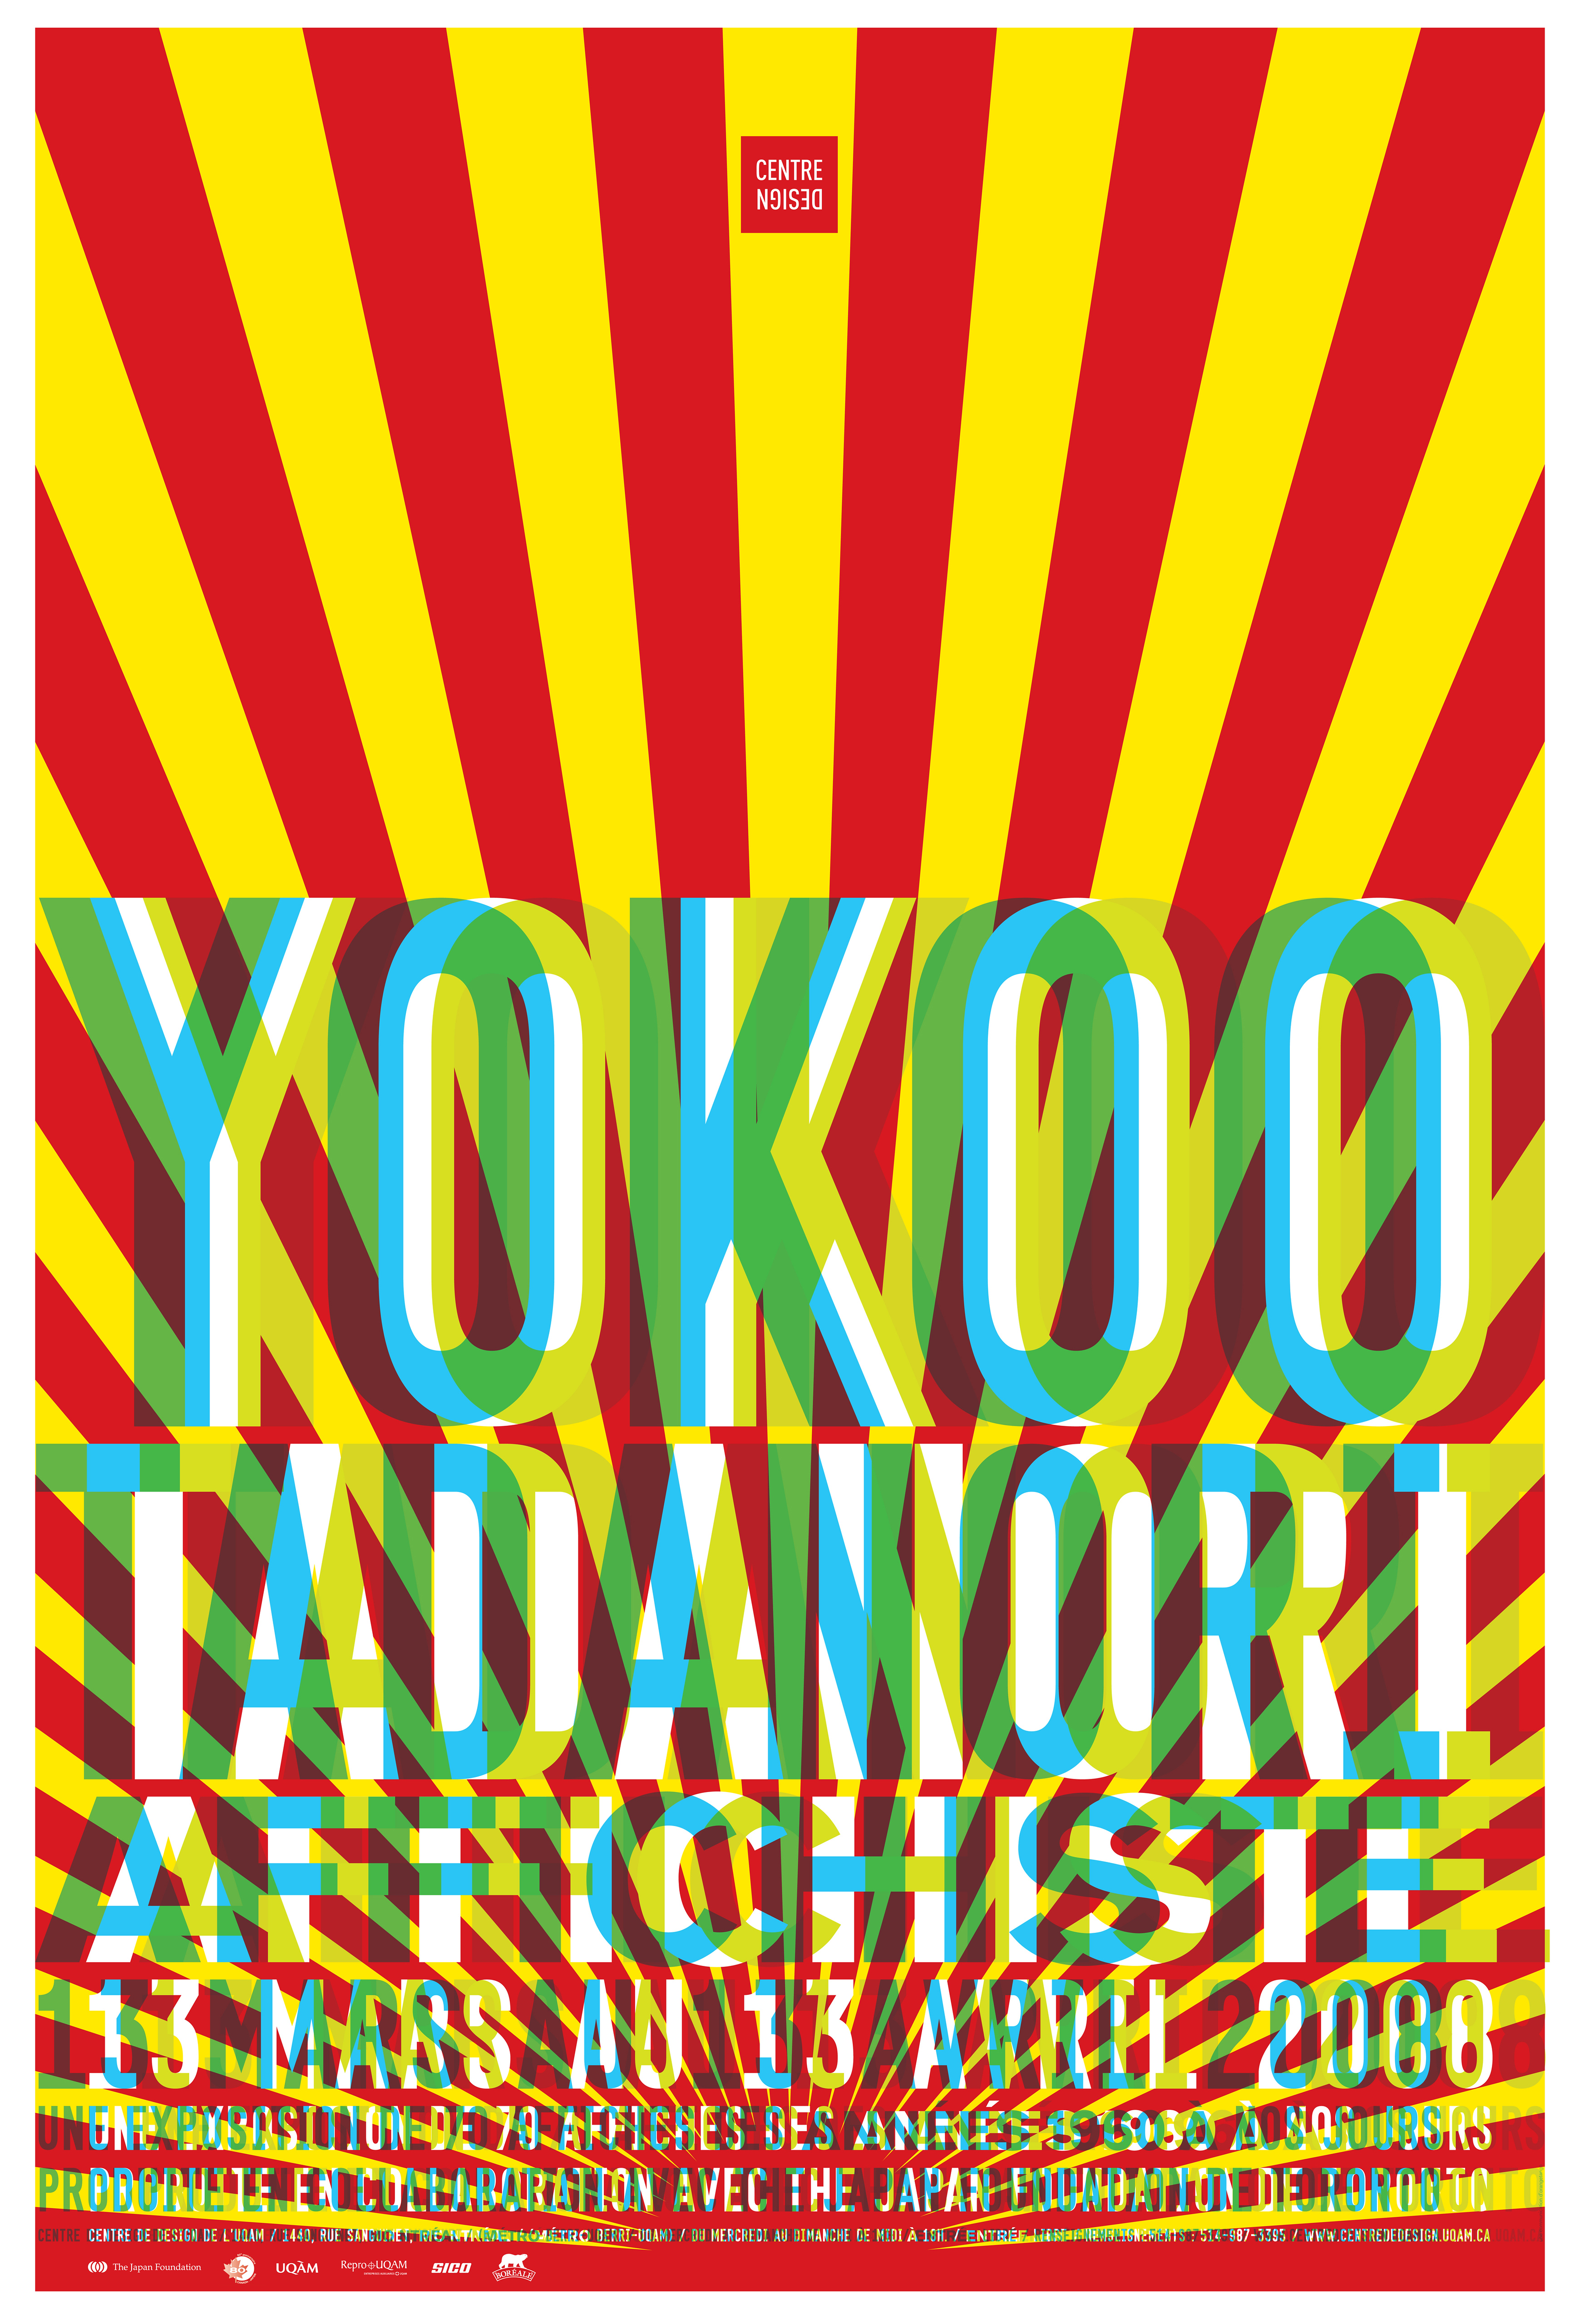 2008 - Exposition - Yokoo Tadanori Affichiste ©Mario Mercier